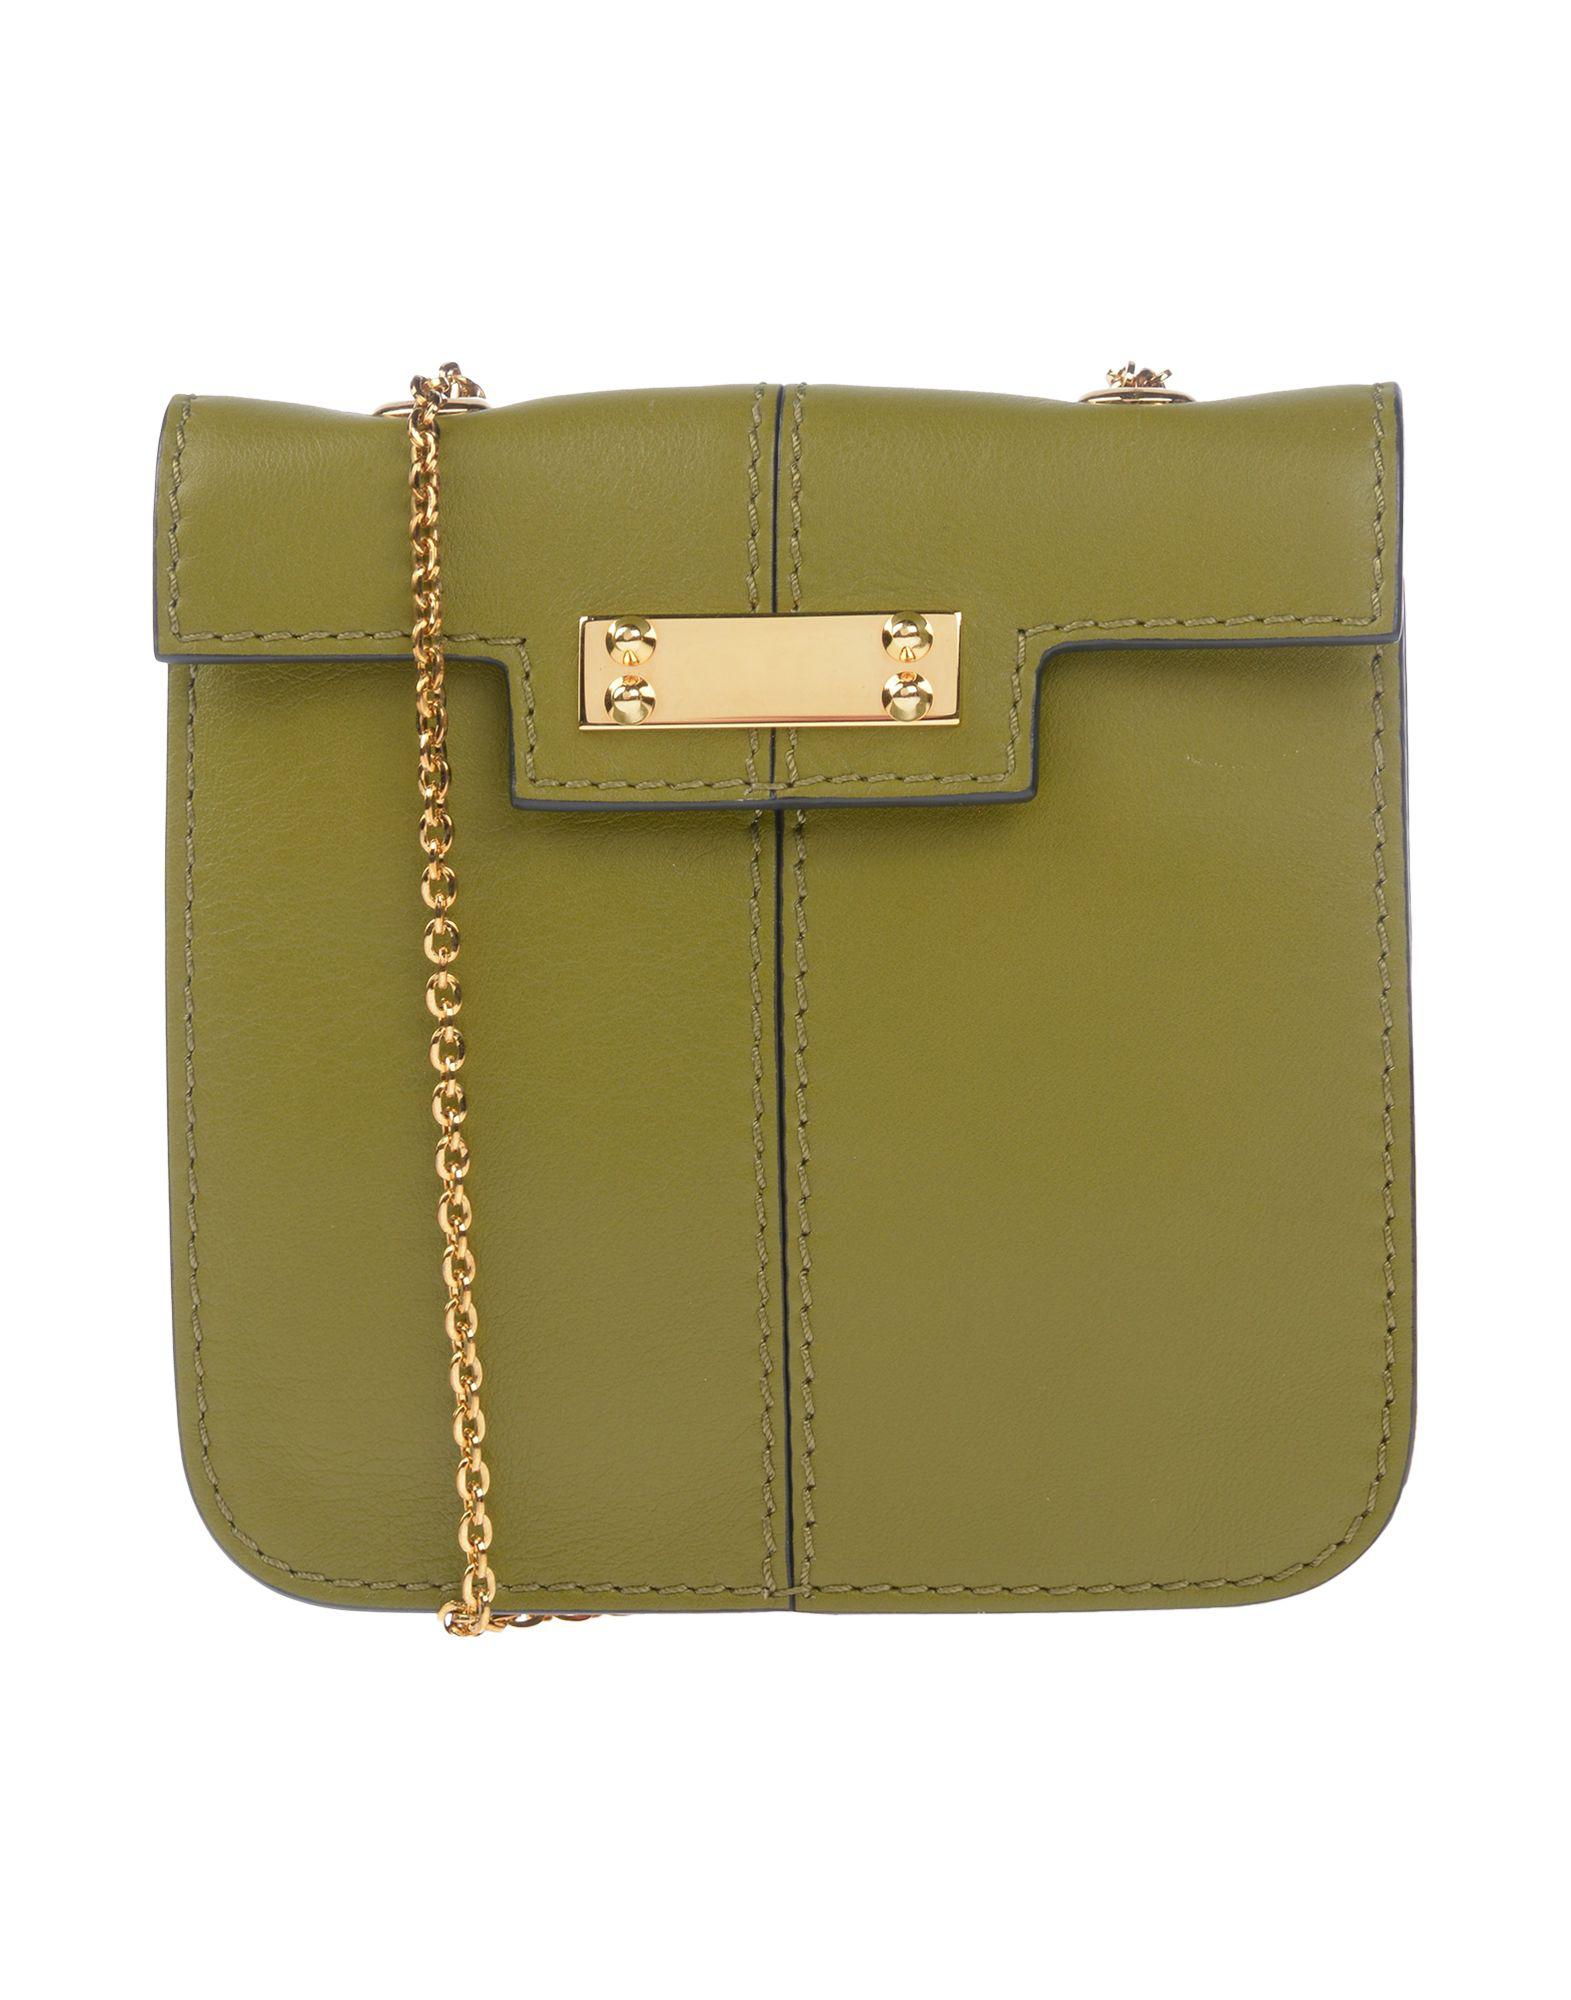 Valentino Shoulder Bag In Military Green